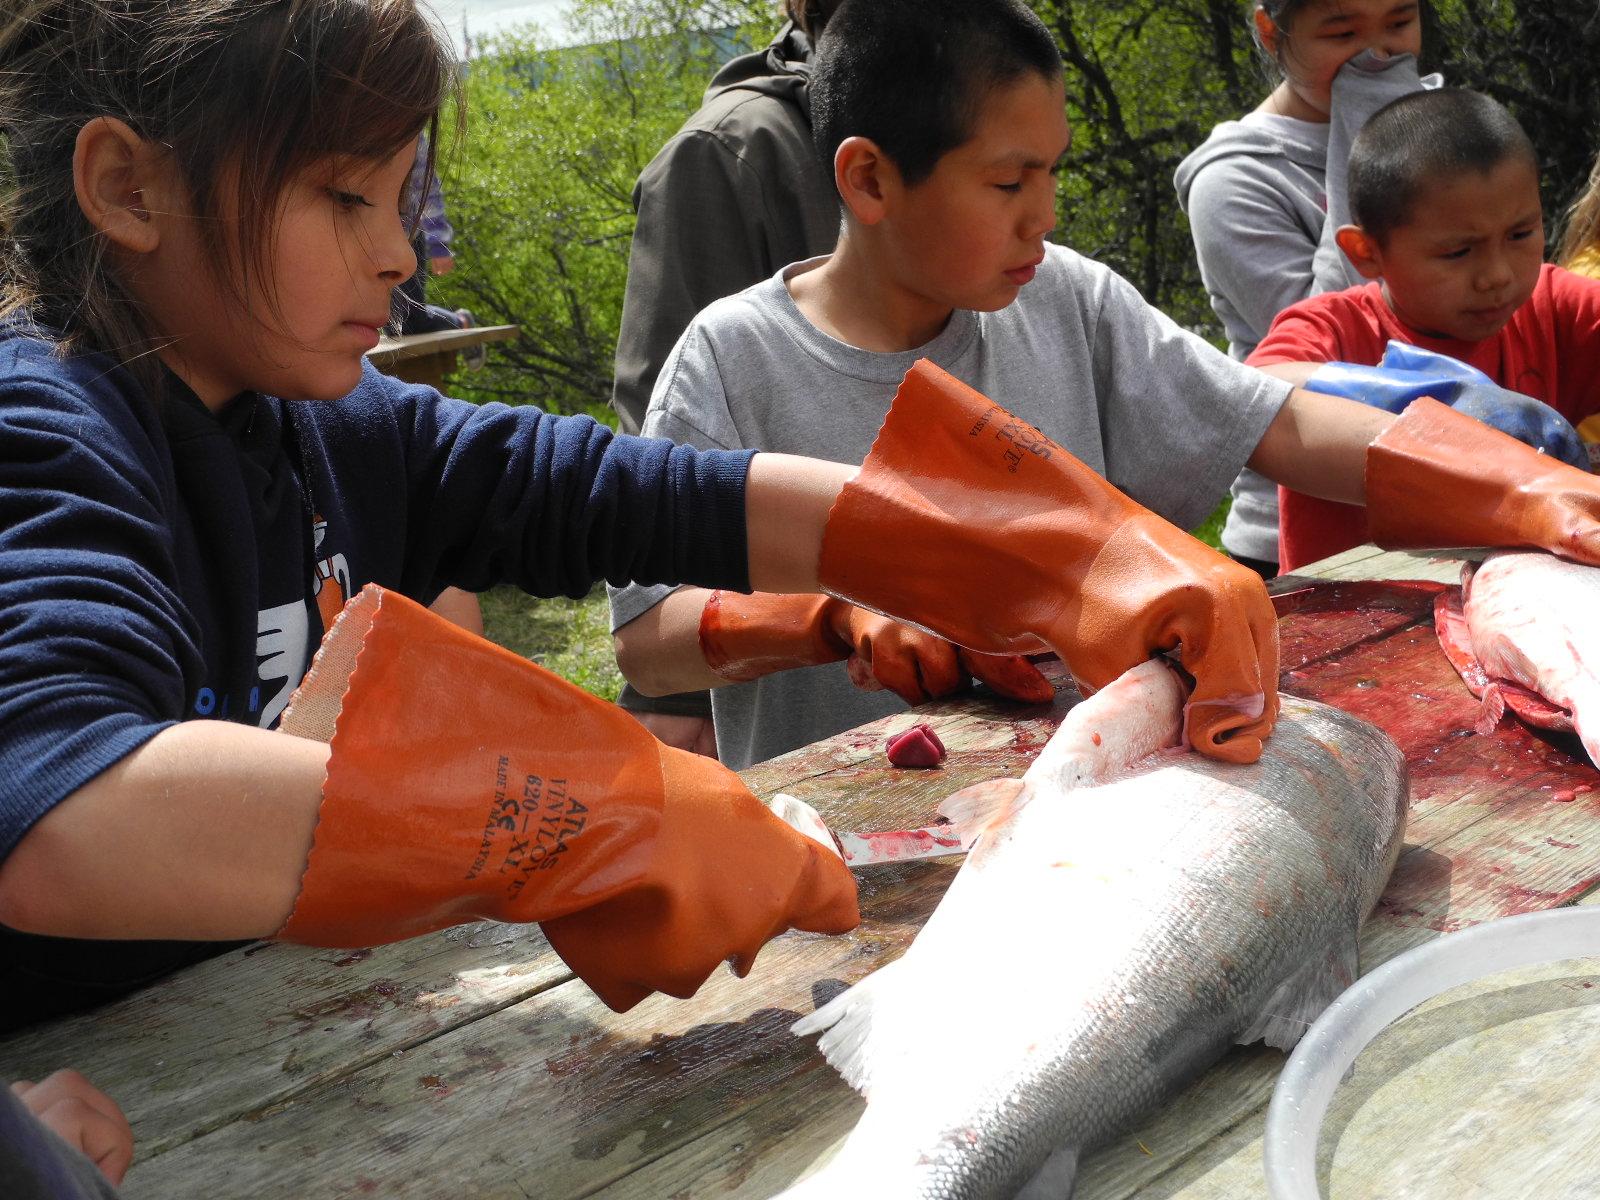 Children cutting fish at the Curyung Tribal Culture Camp in Dillingham, AK.